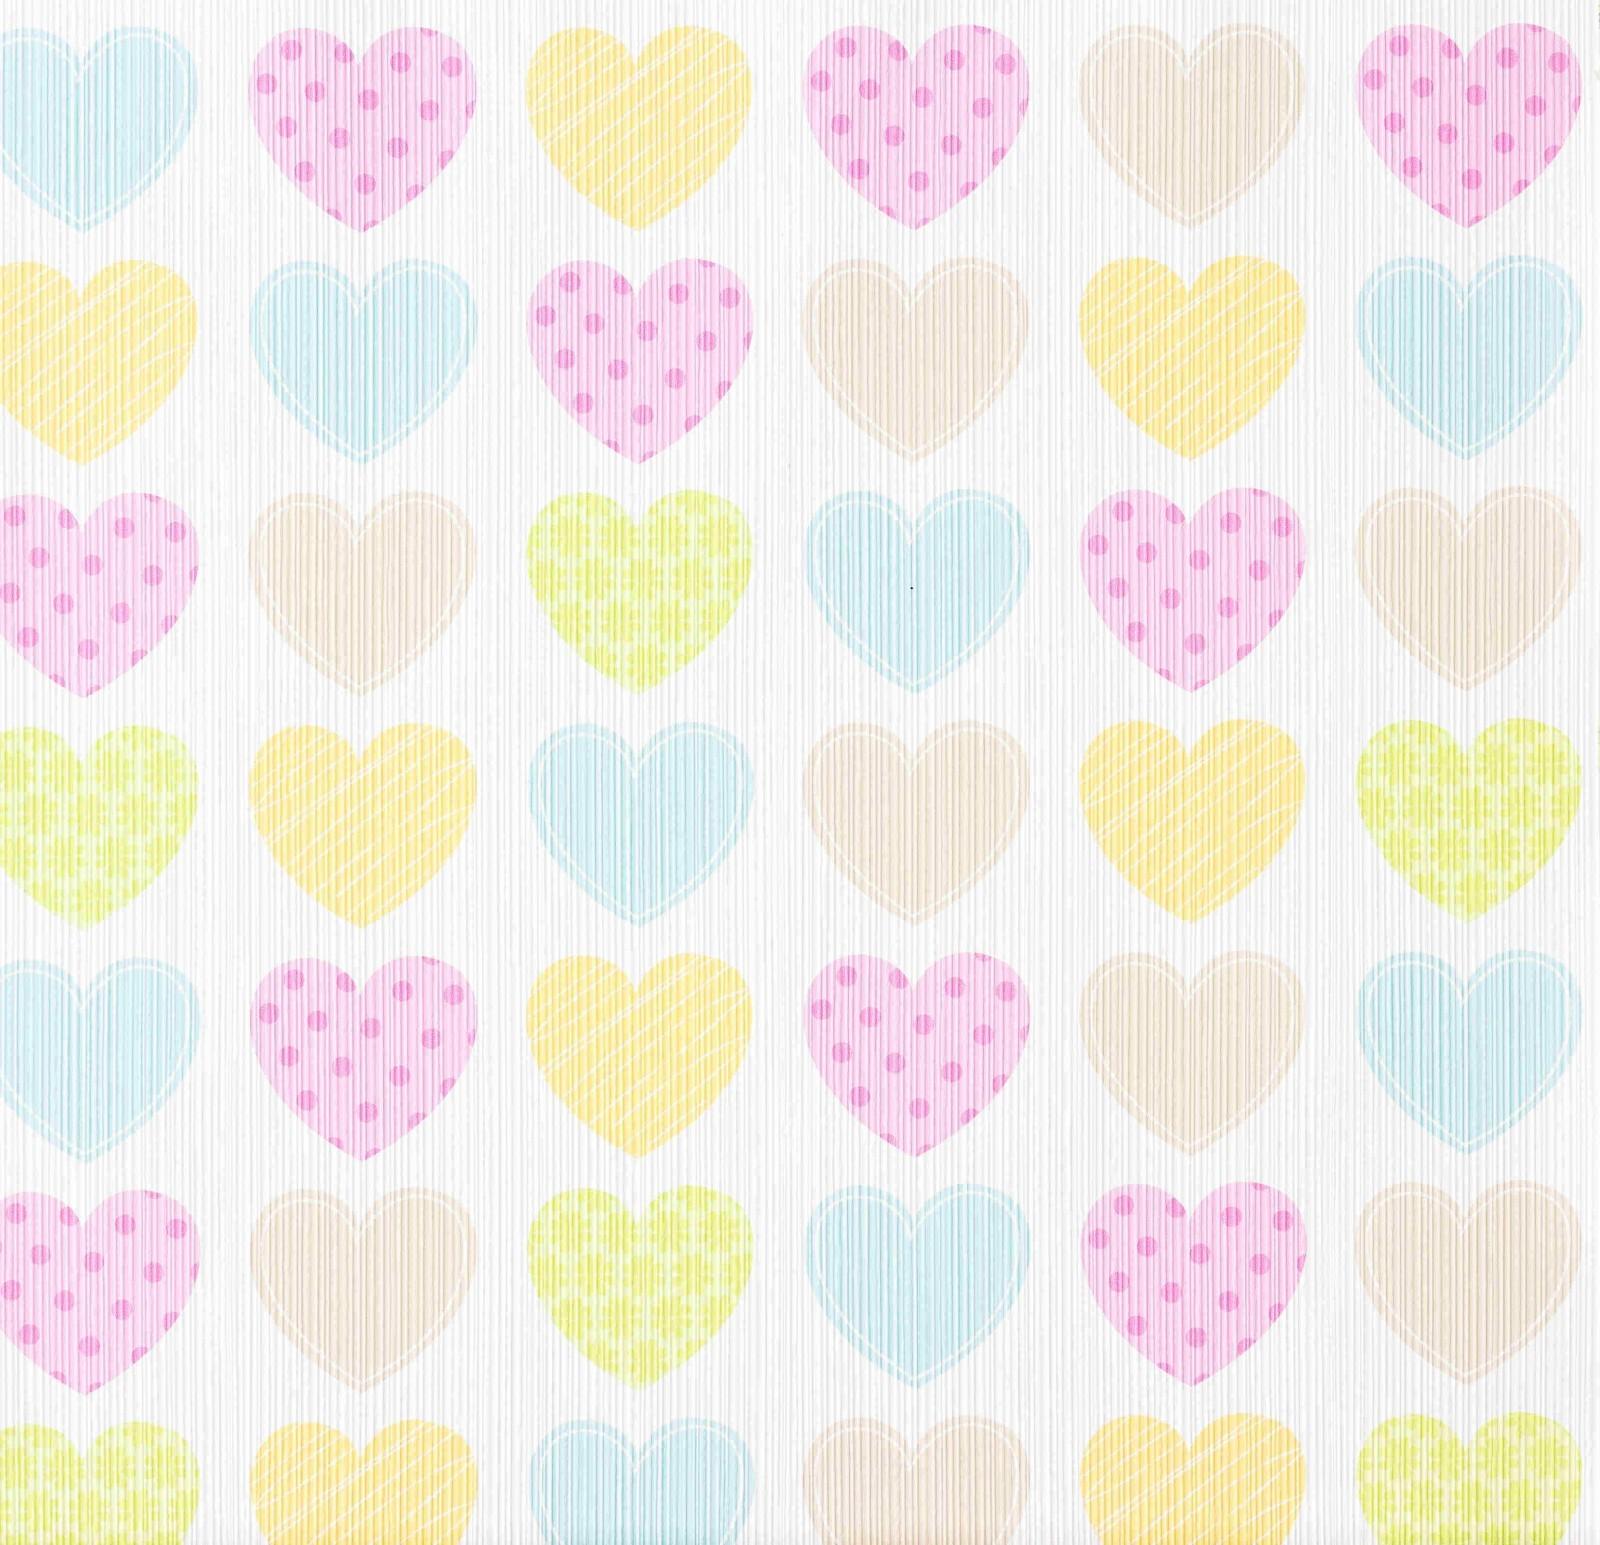 ديكورات غرف نوم للبنات 2021-ورق حائط قلوب